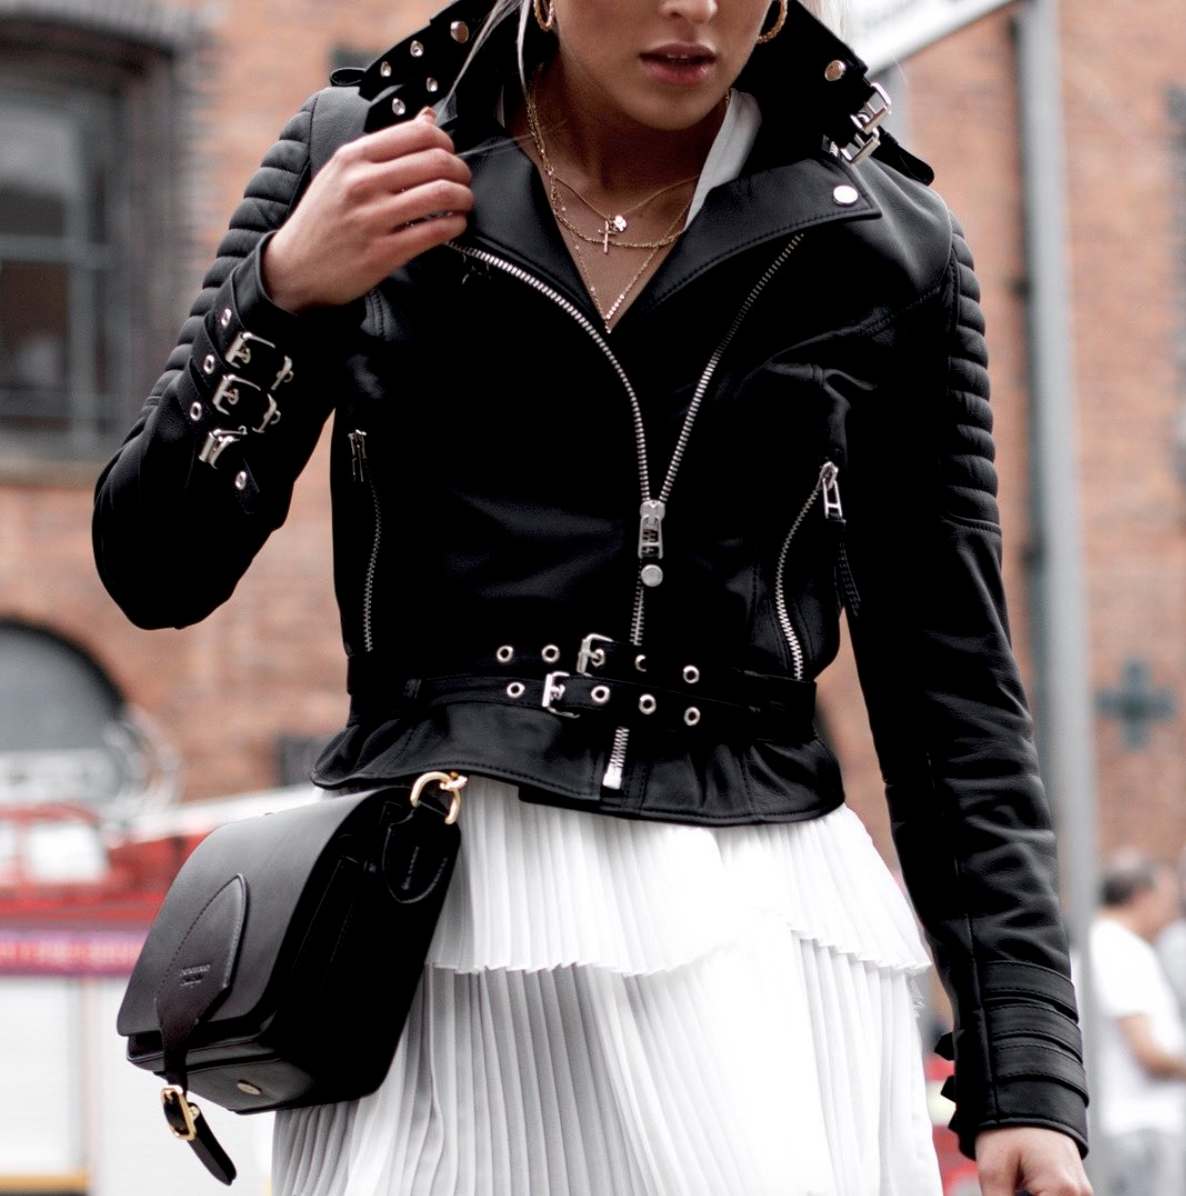 Women S Ribbed Black Leather Jacket Lookbook Outfits Leather Jackets Women Leather Jacket [ 1196 x 1186 Pixel ]